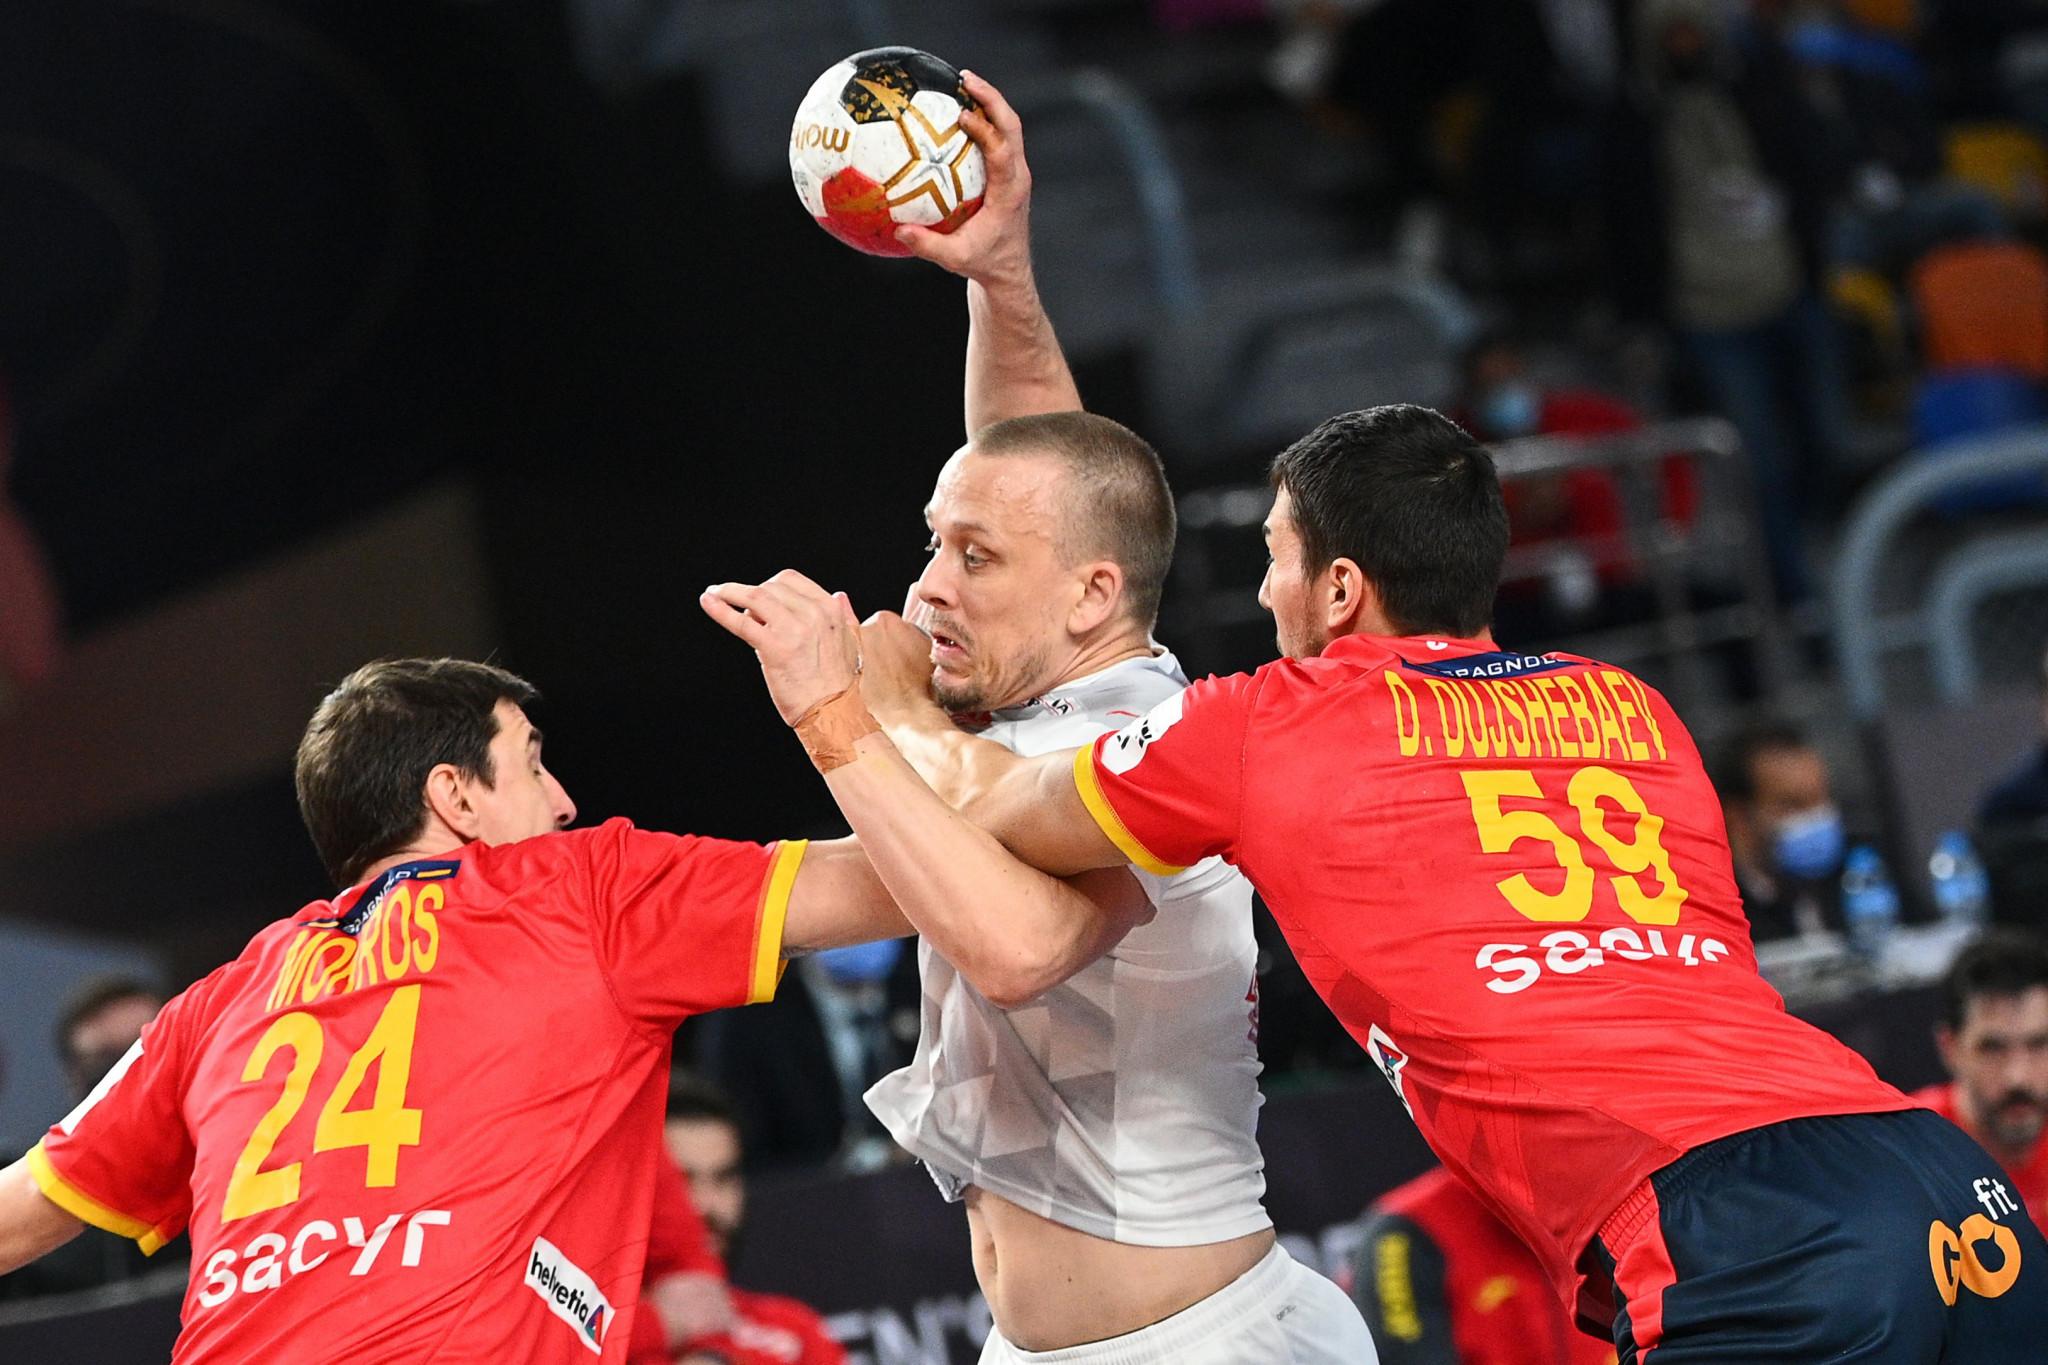 Defending champions Denmark to face Sweden in IHF World Men's Handball Championship final